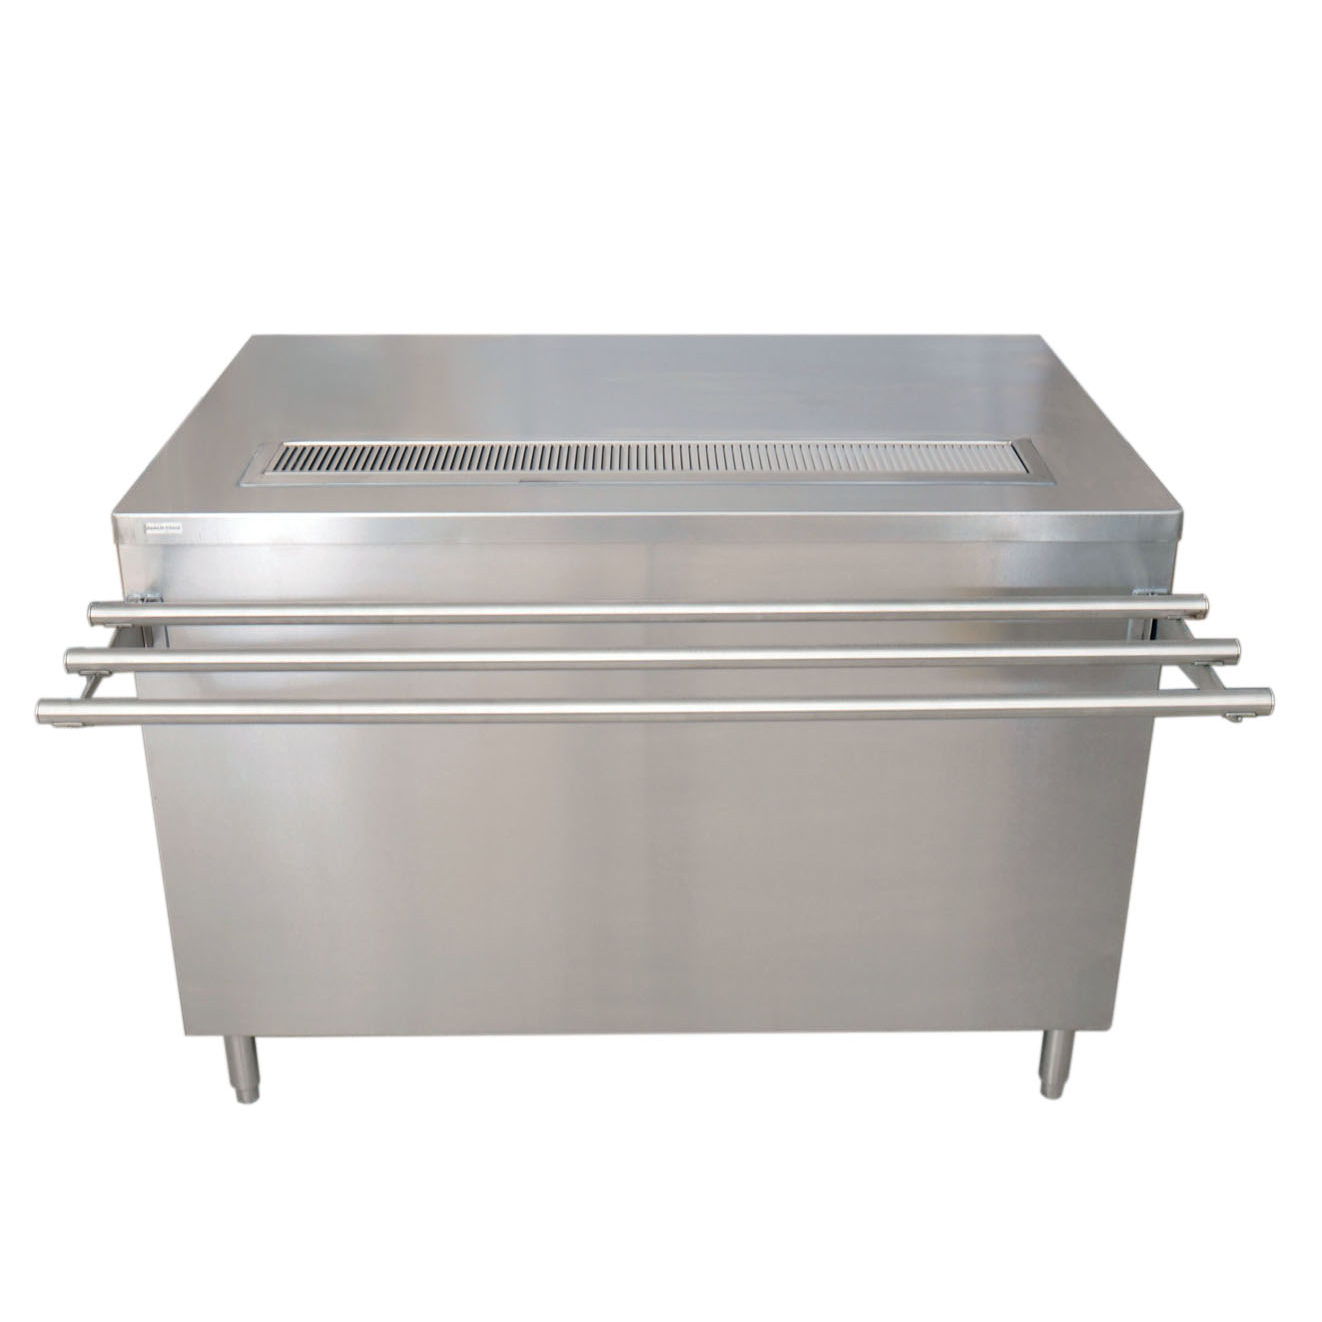 BK Resources US-3072C-H serving counter, beverage